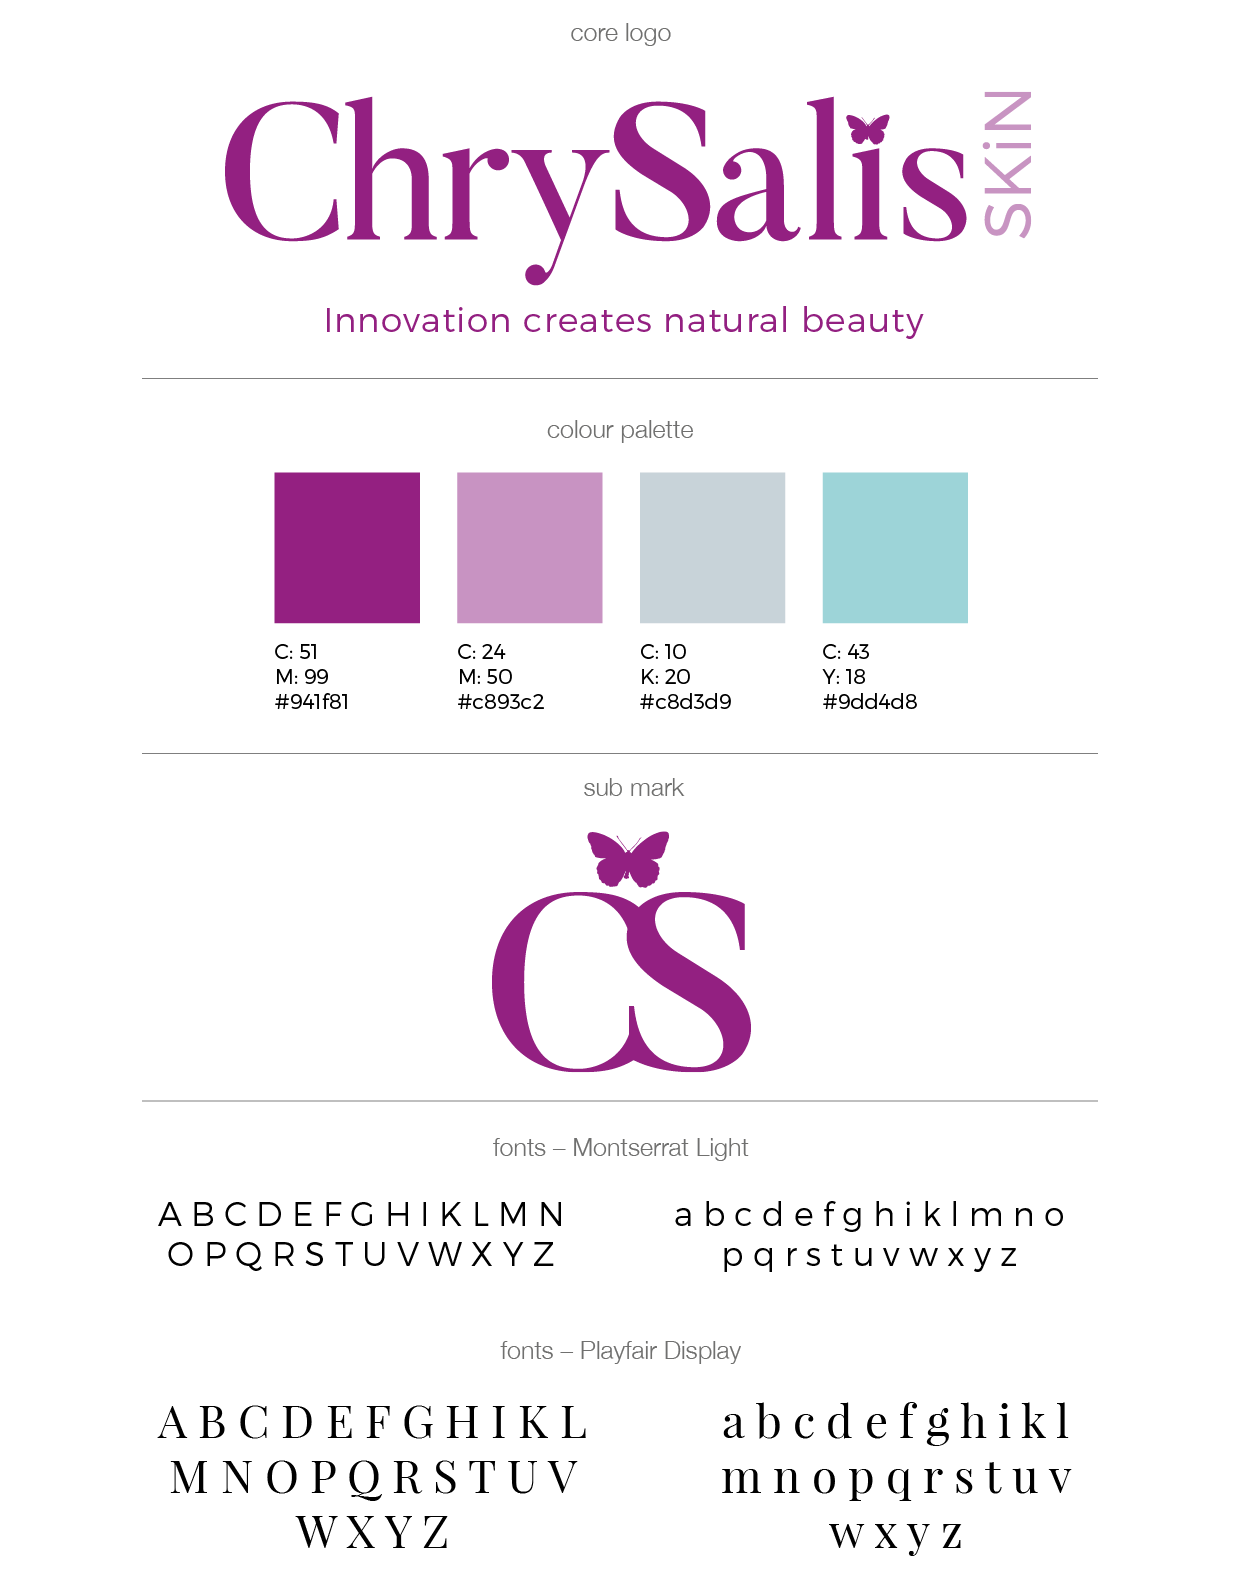 Chrysalis Skin Brand Board